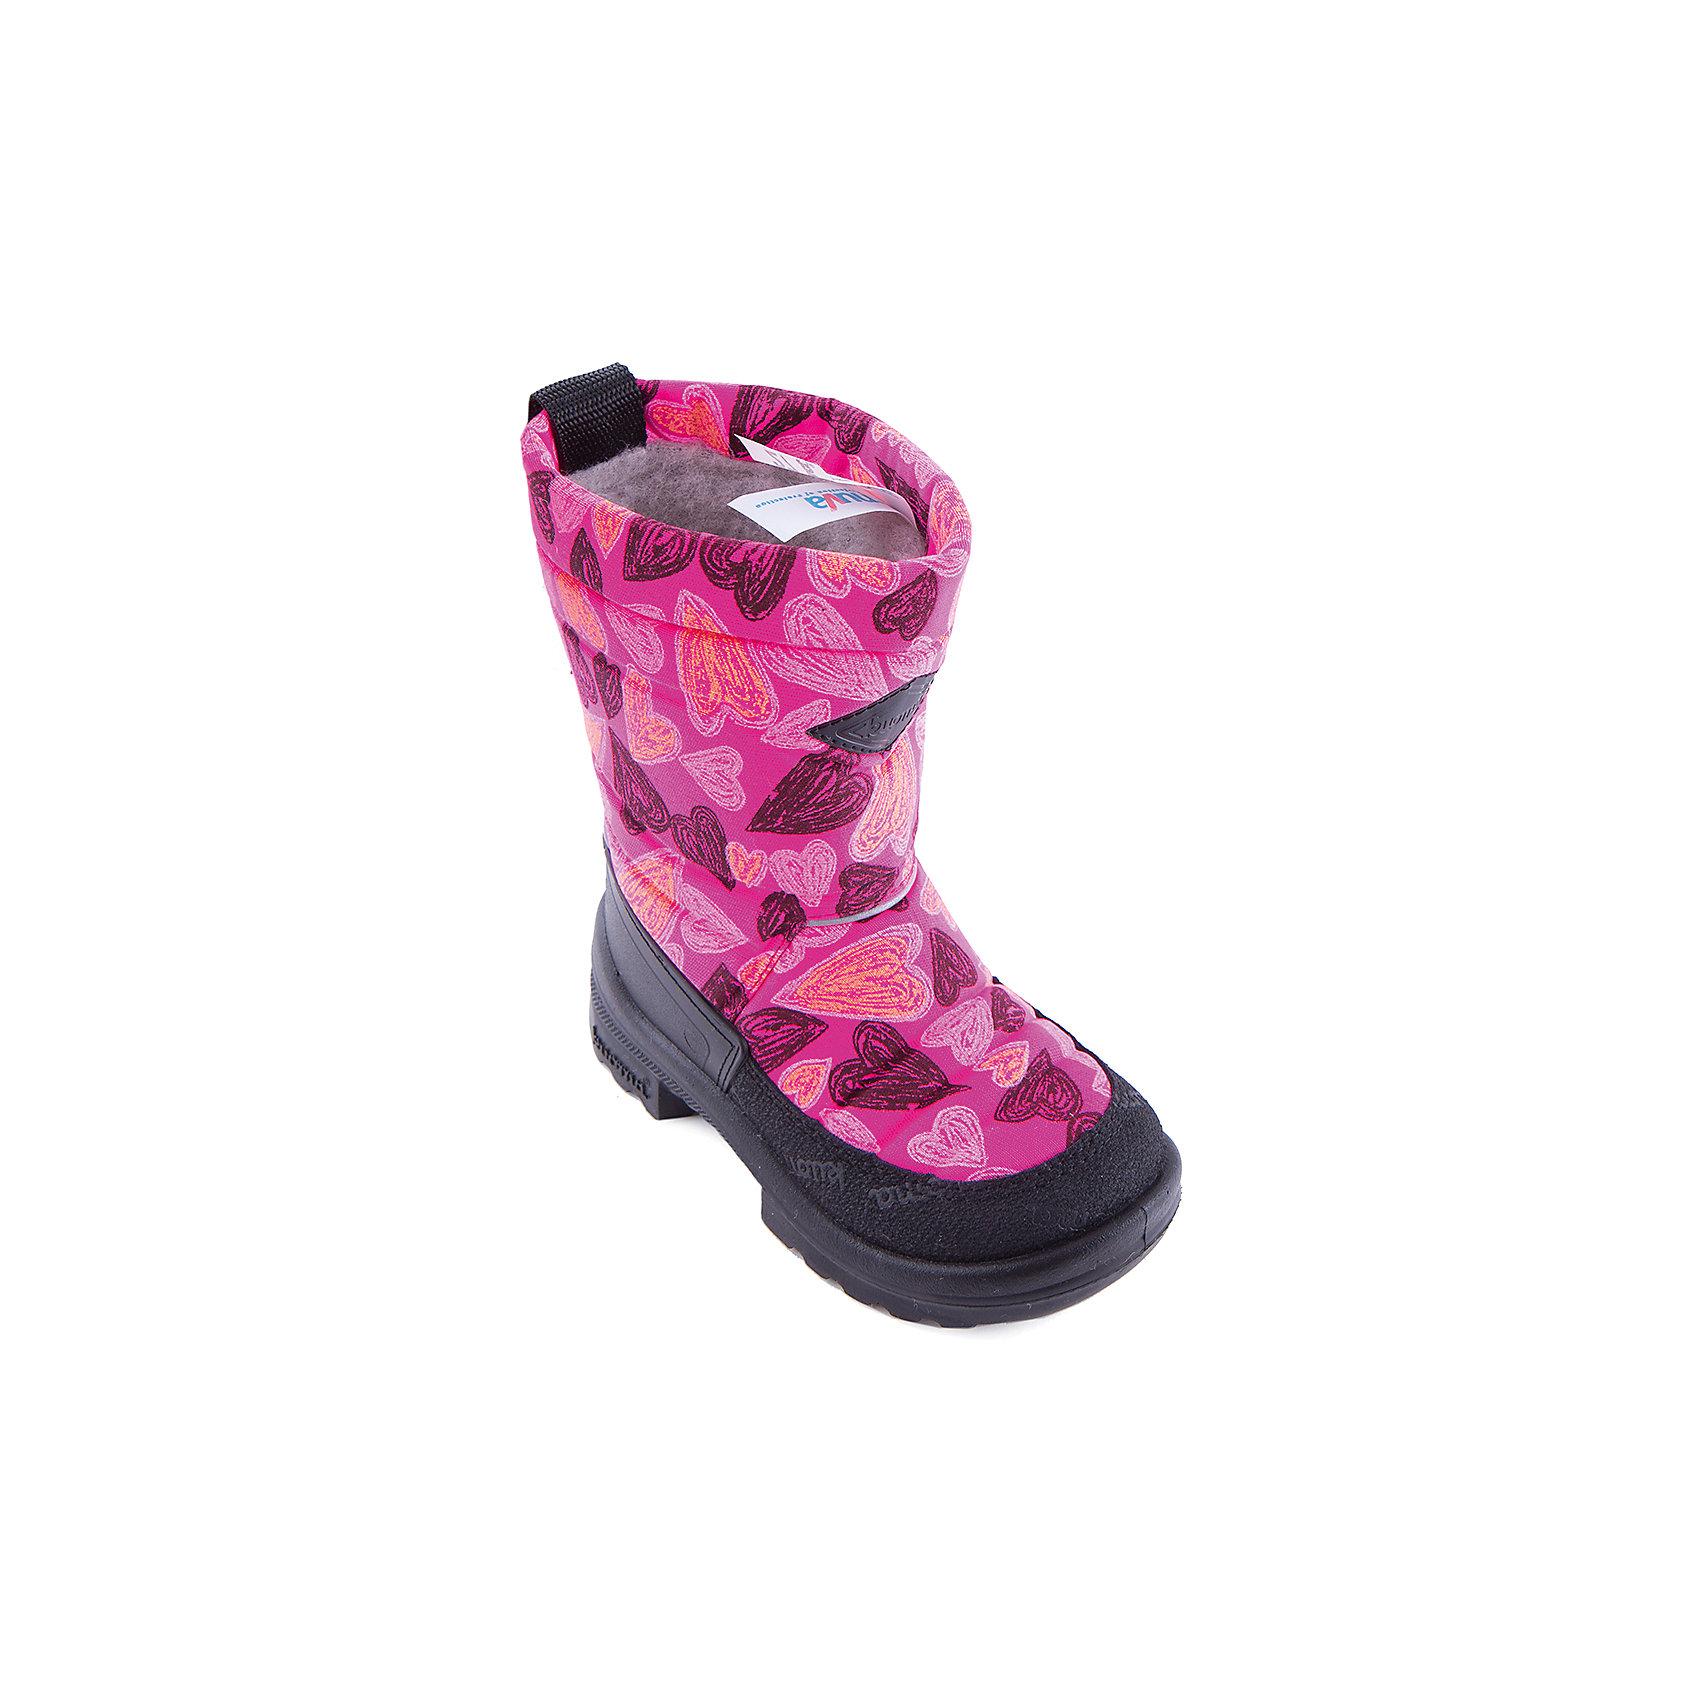 KUOMA Зимние сапоги Putkivarsi для девочки KUOMA сапоги kuoma путкиварси розовый cyclamenflower 33